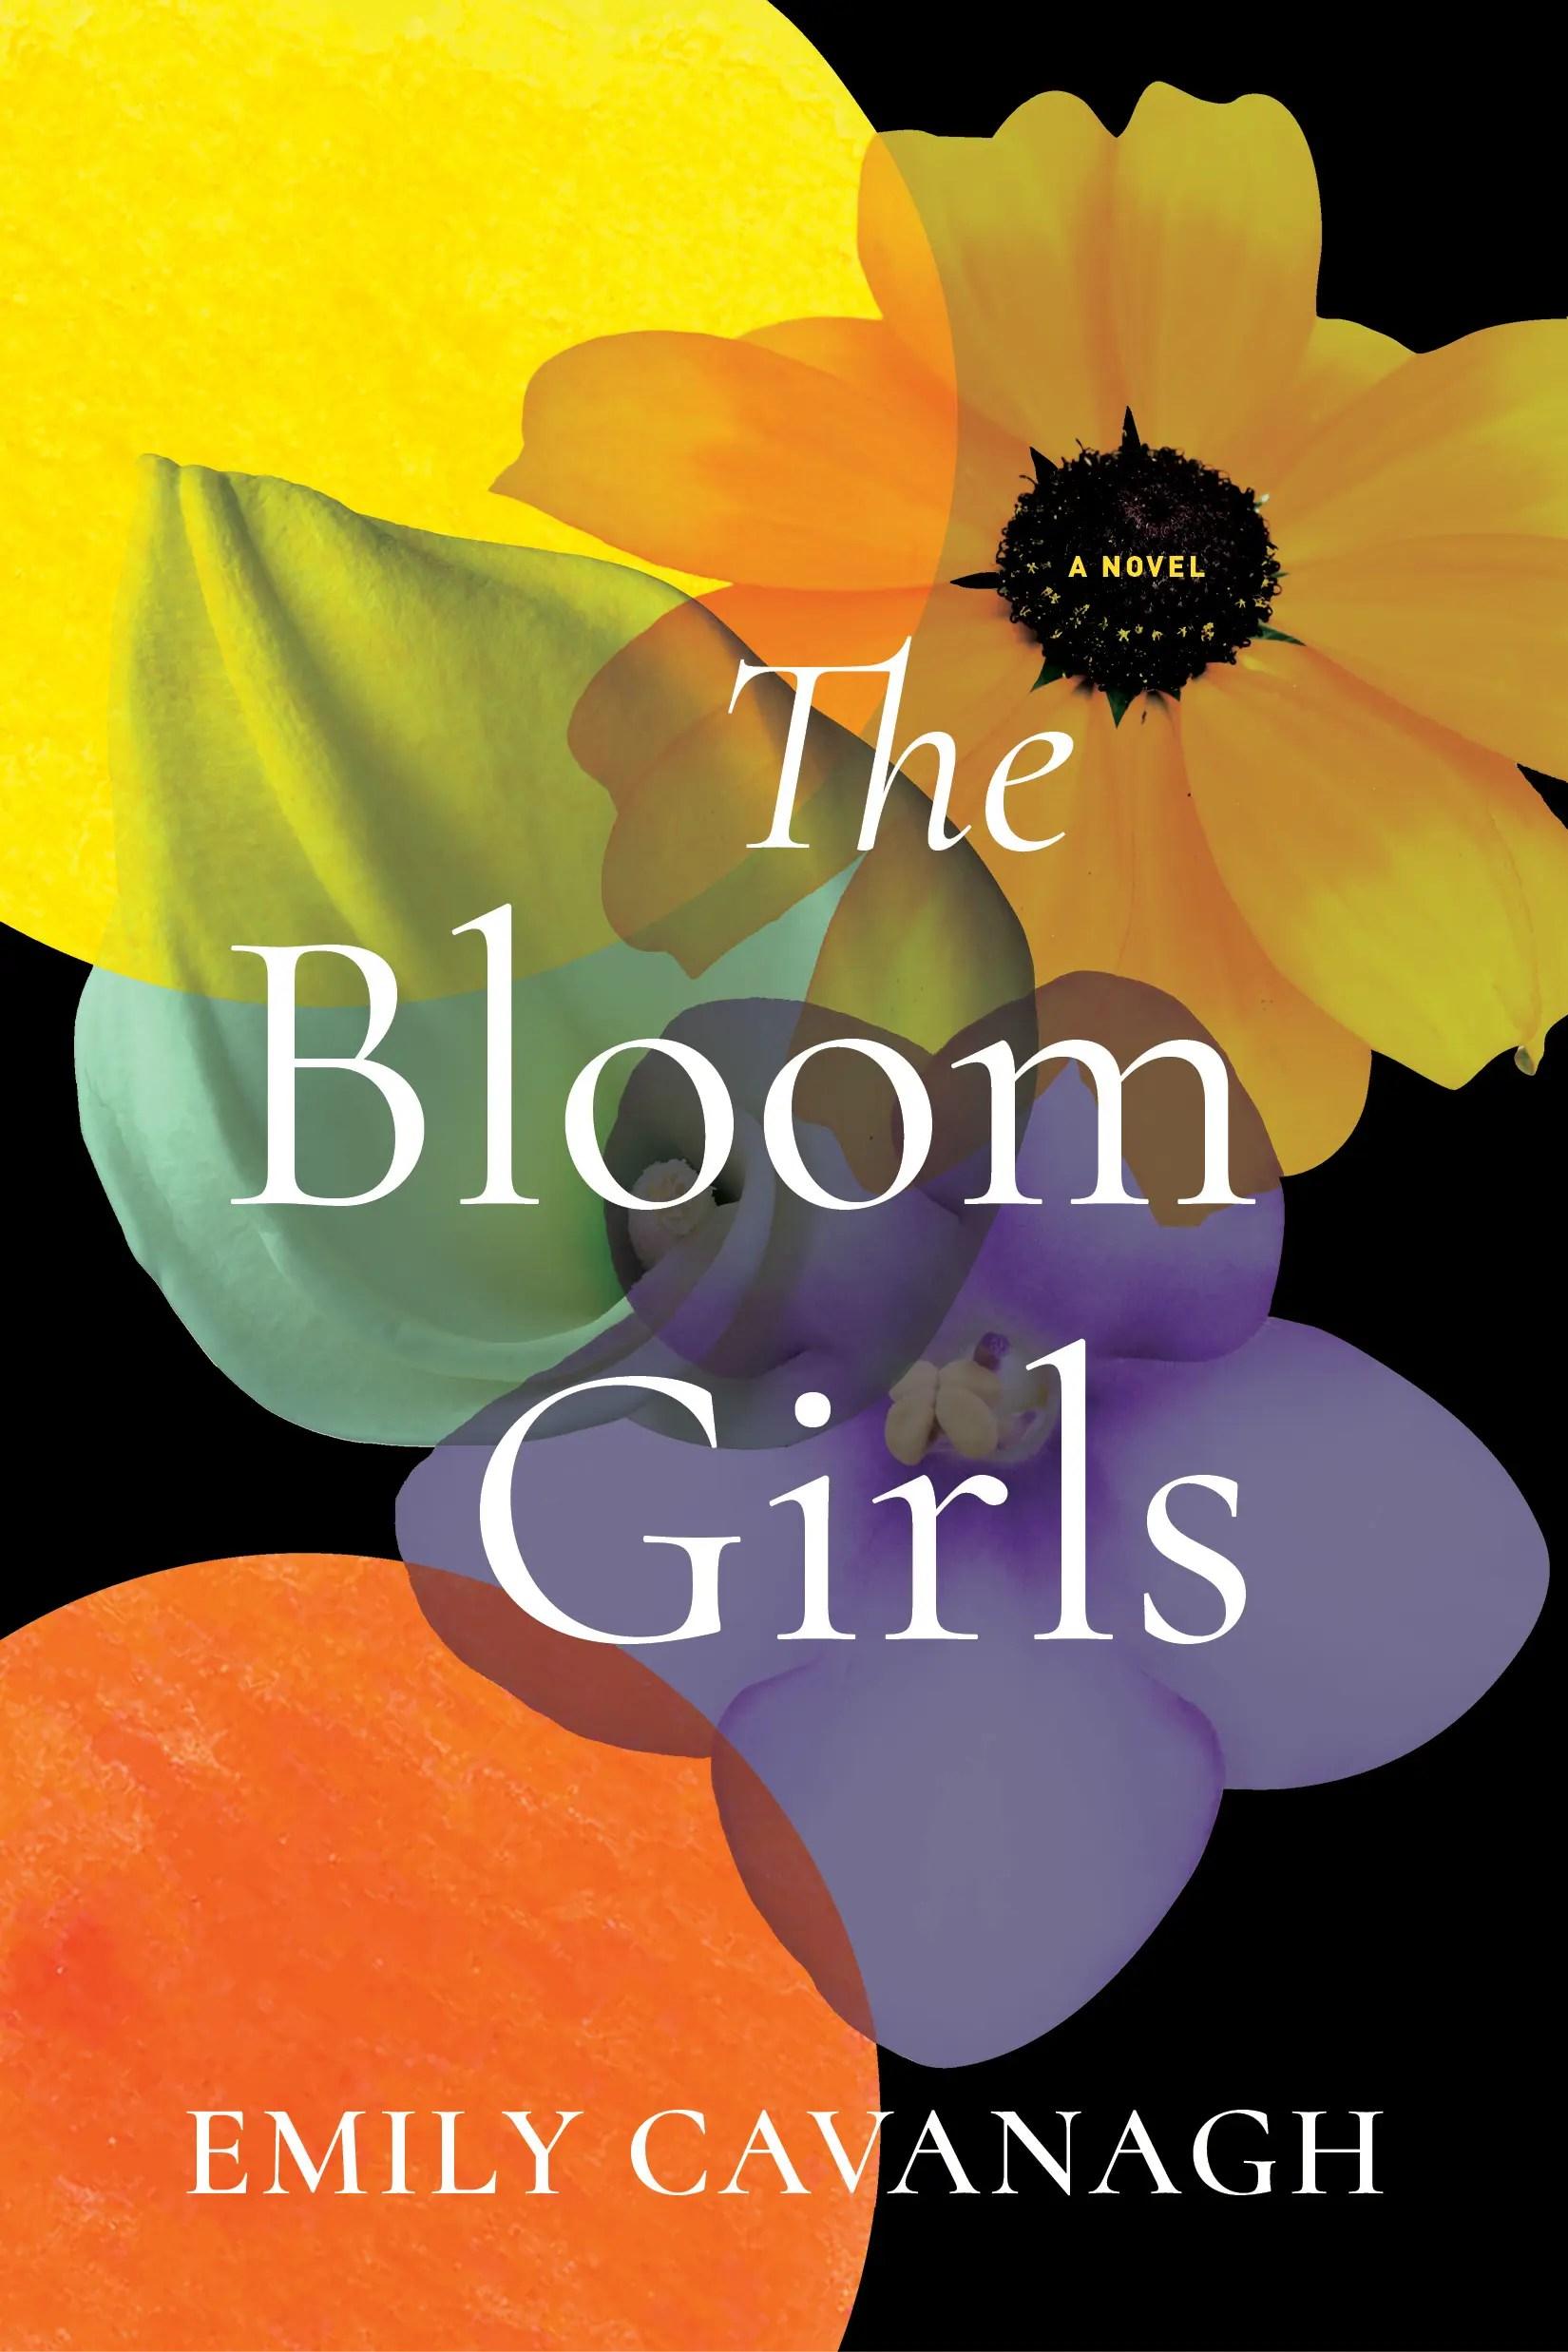 The Bloom Girls | leahdecesare.com